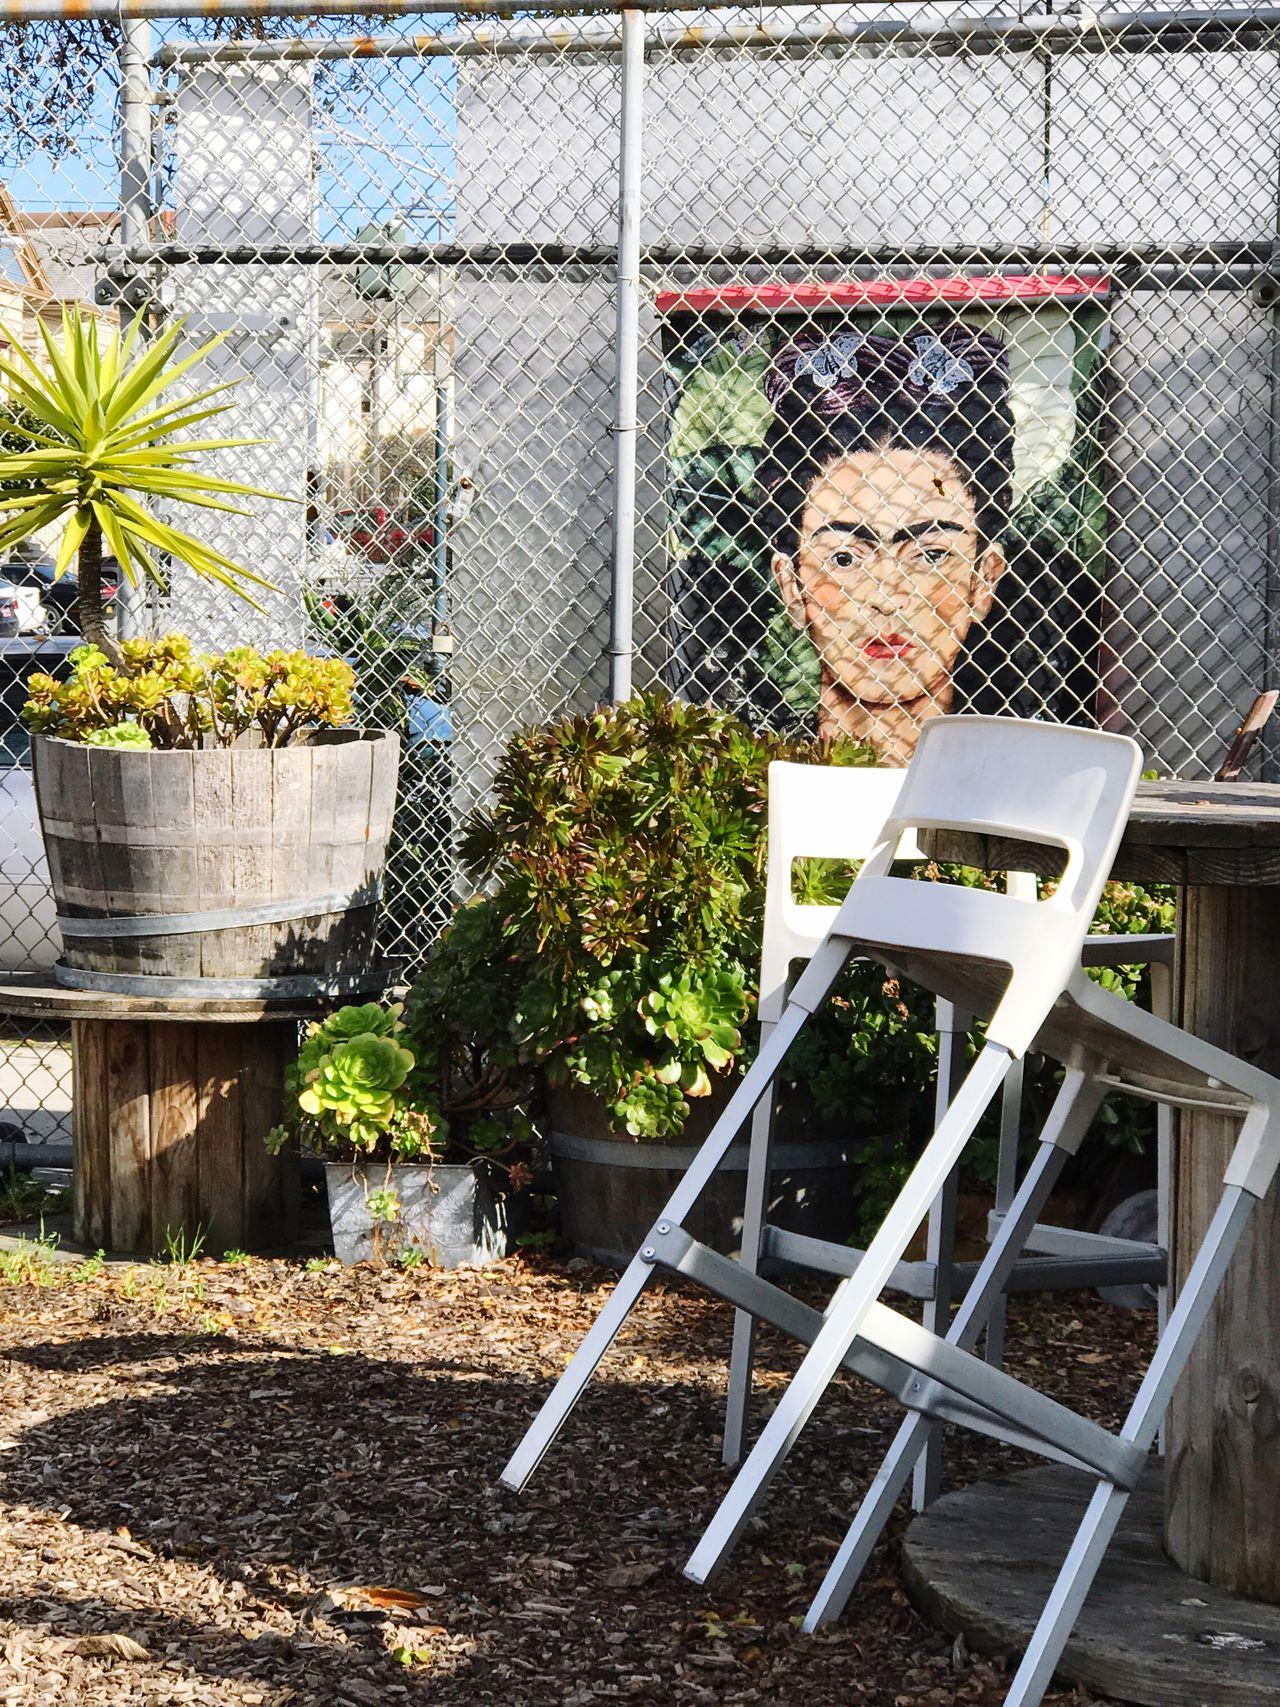 Frida behind the fence //